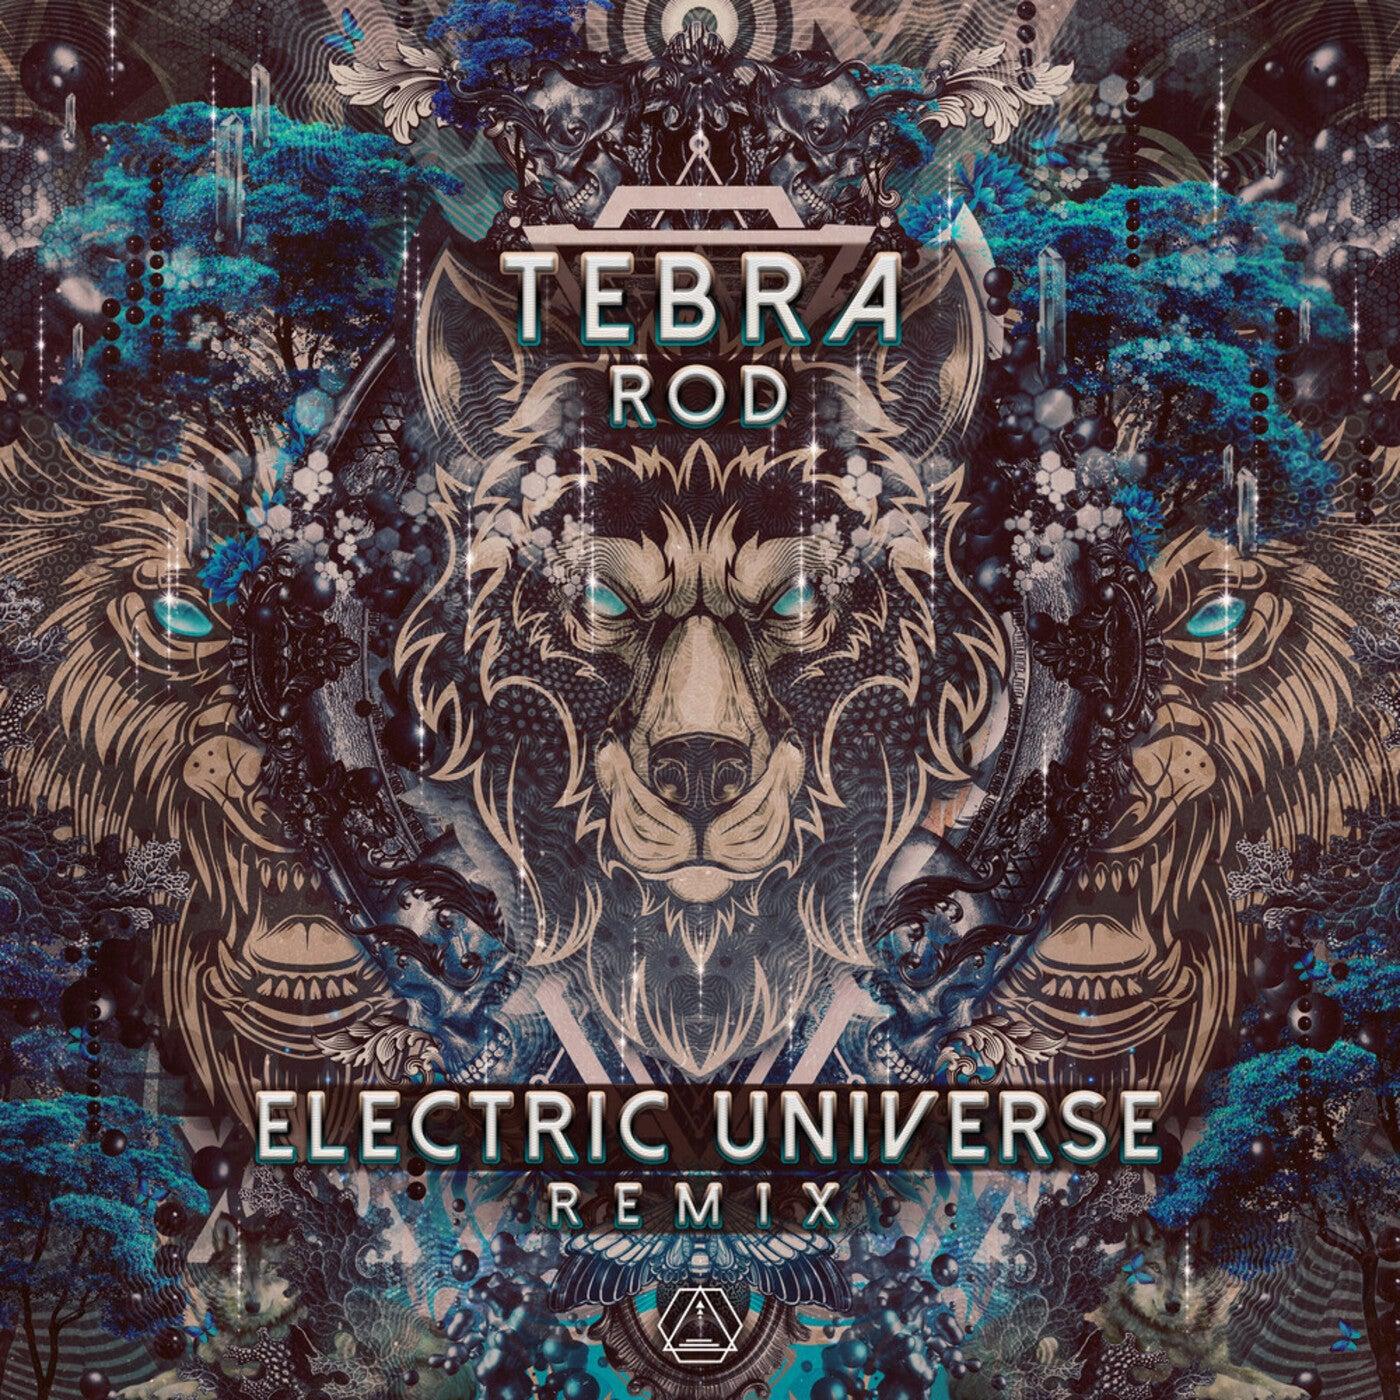 Rod (Electric Universe Remix)